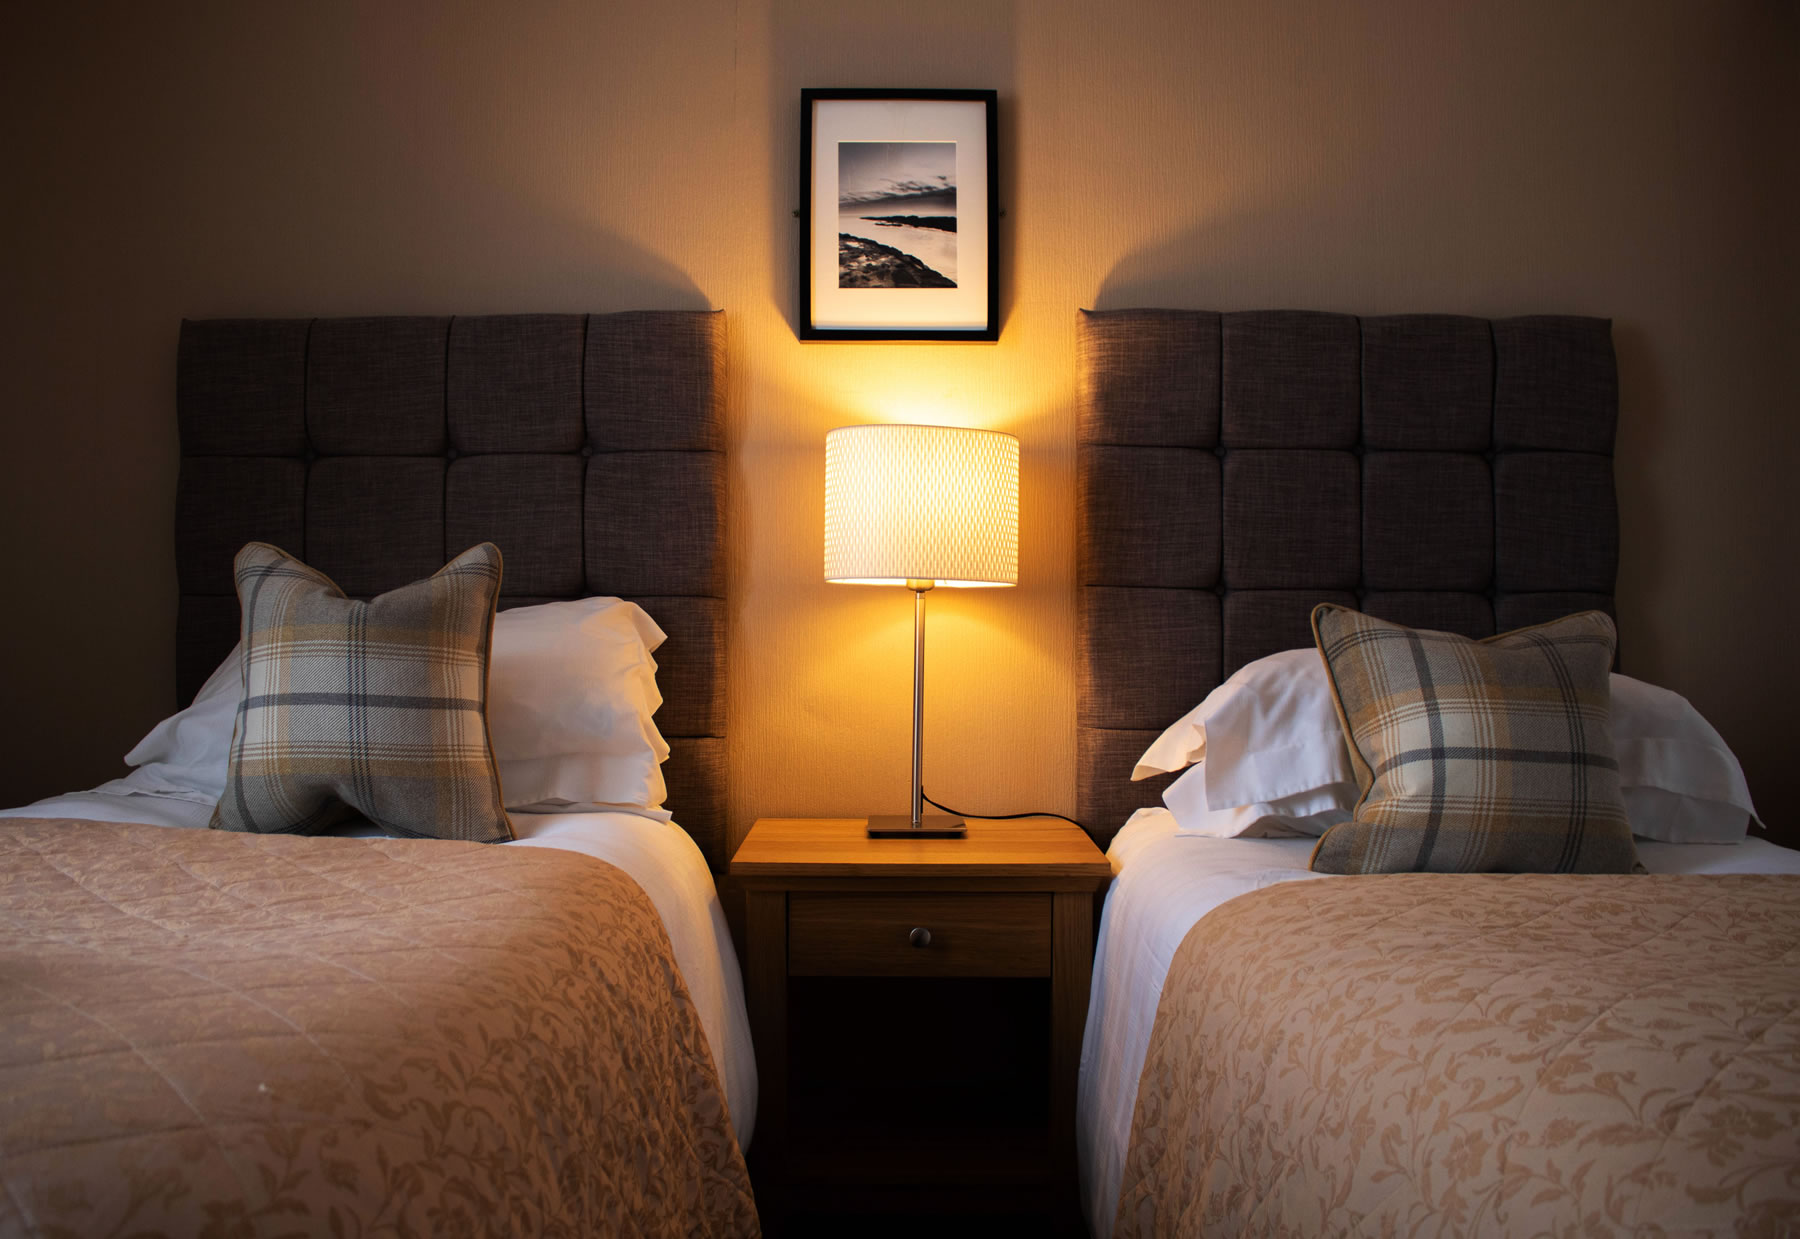 Accommodation at the Upper Largo Hotel